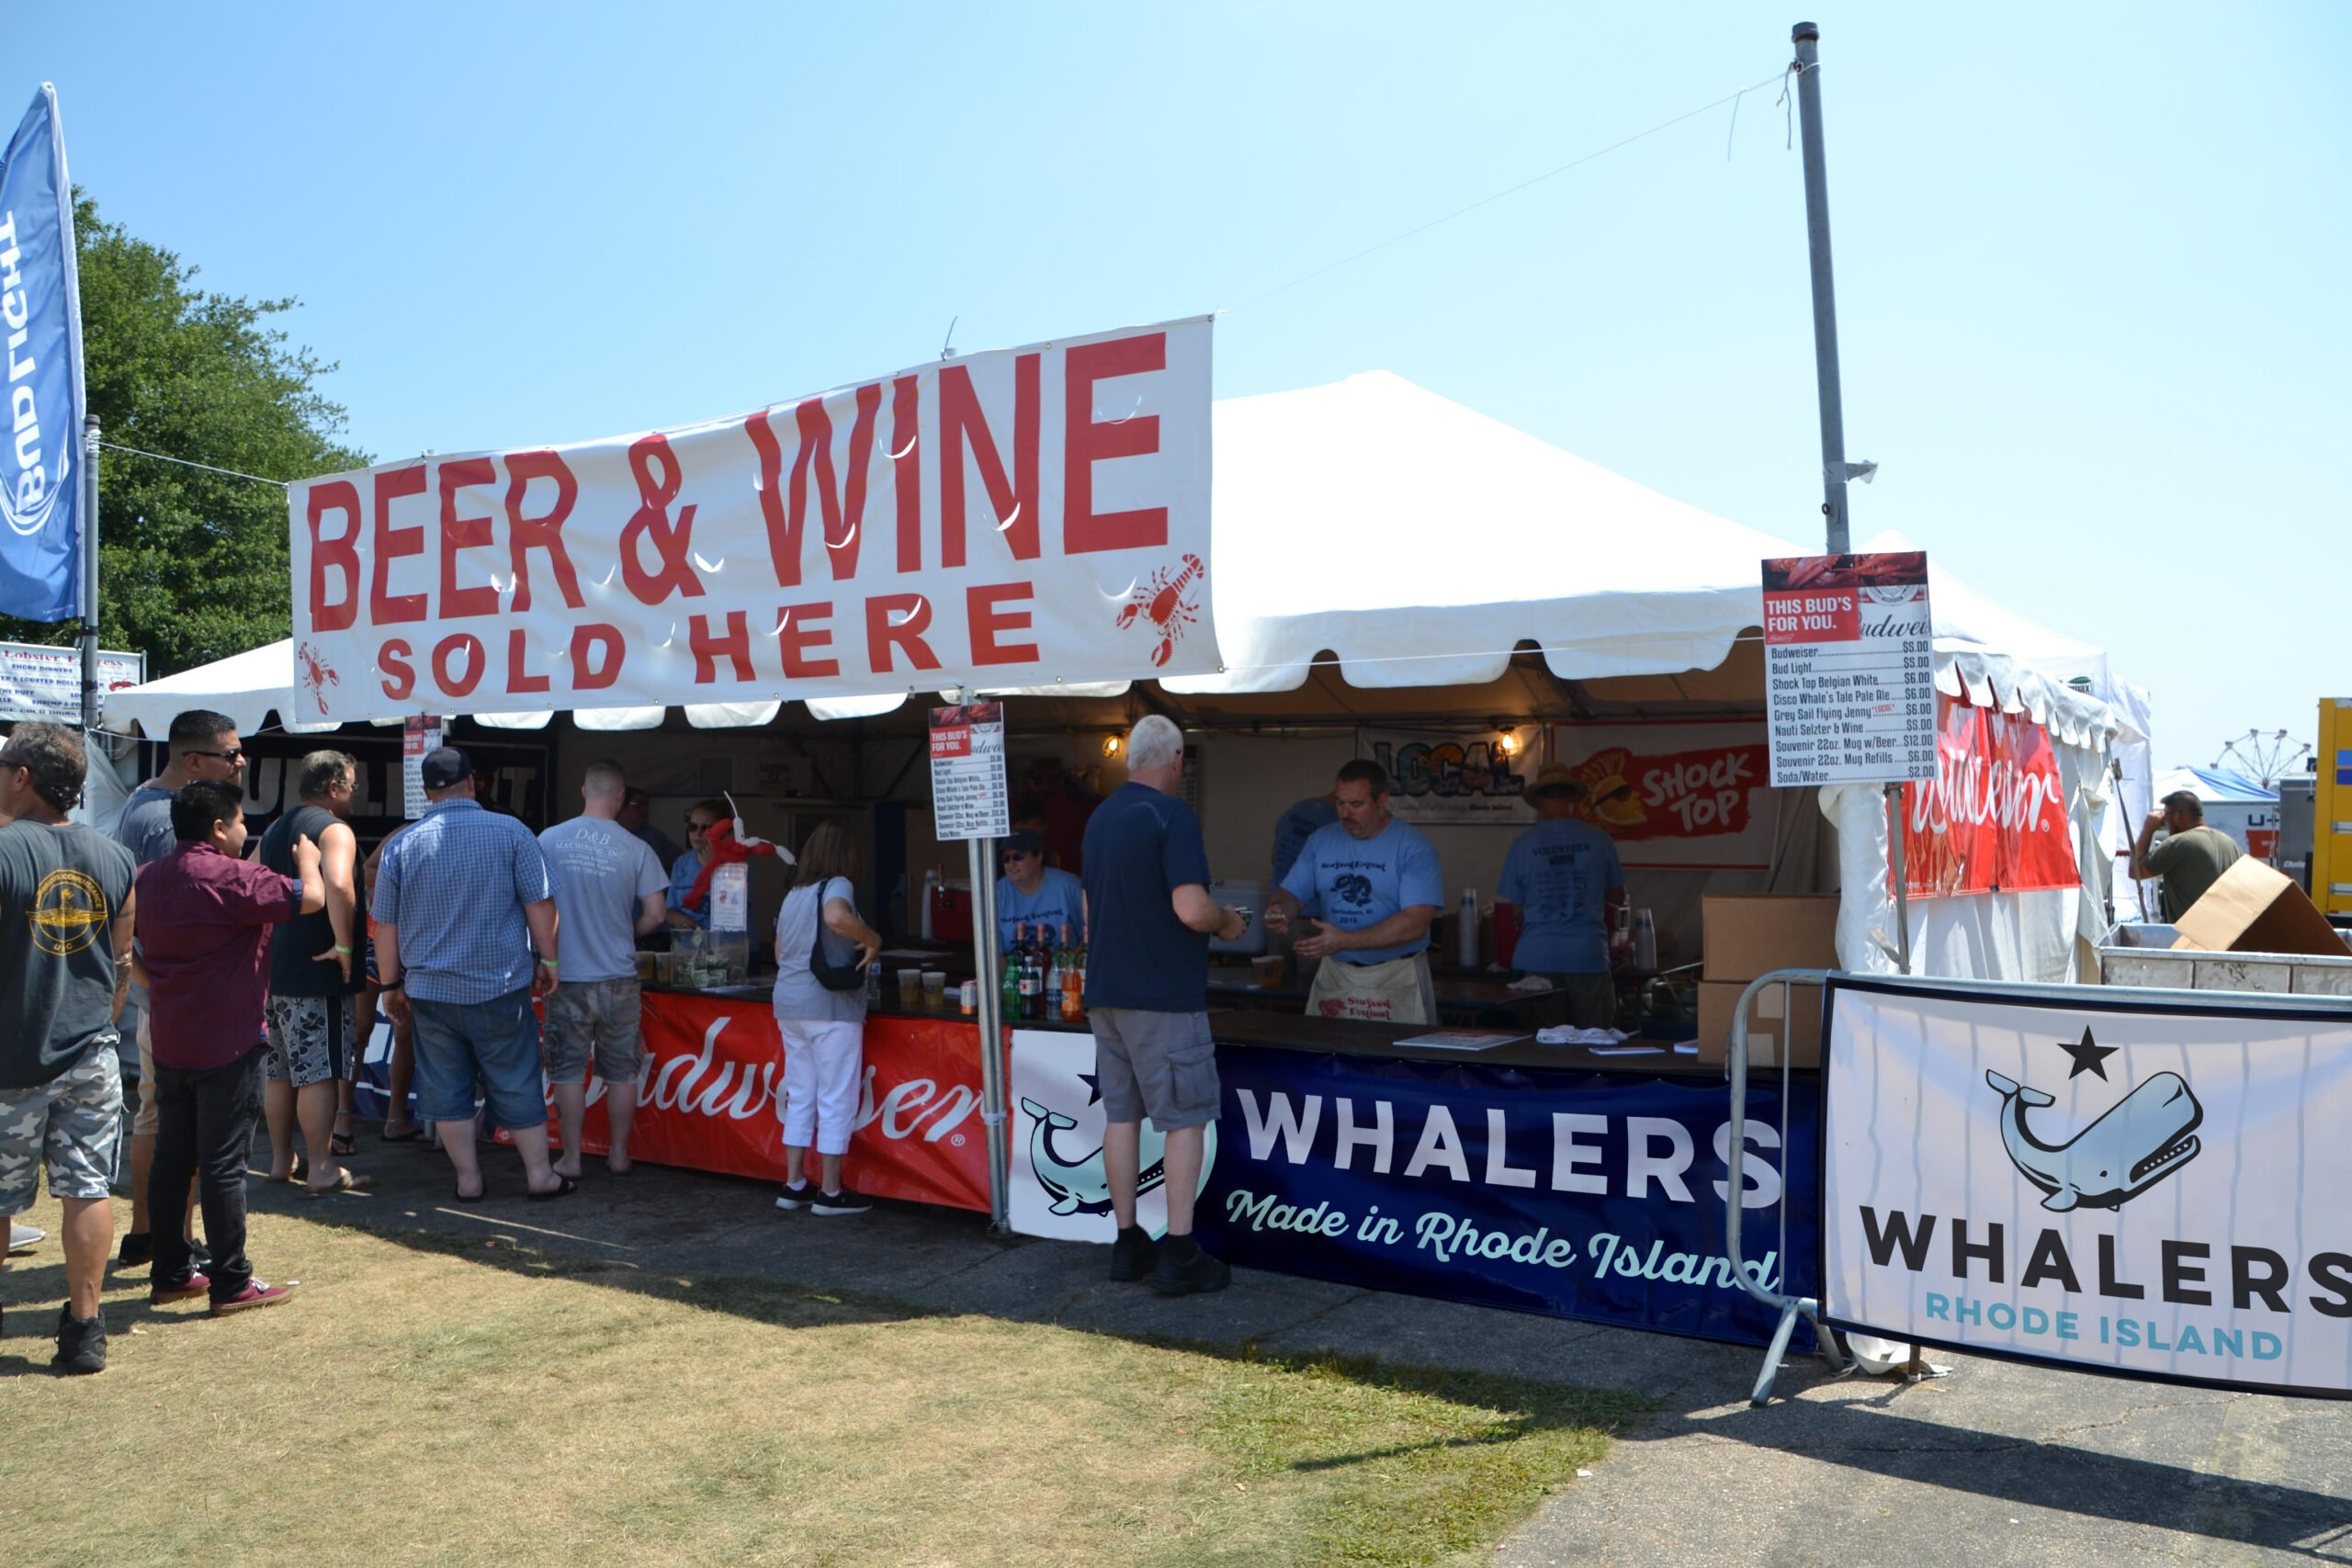 charlestown seafood festival beer and wine